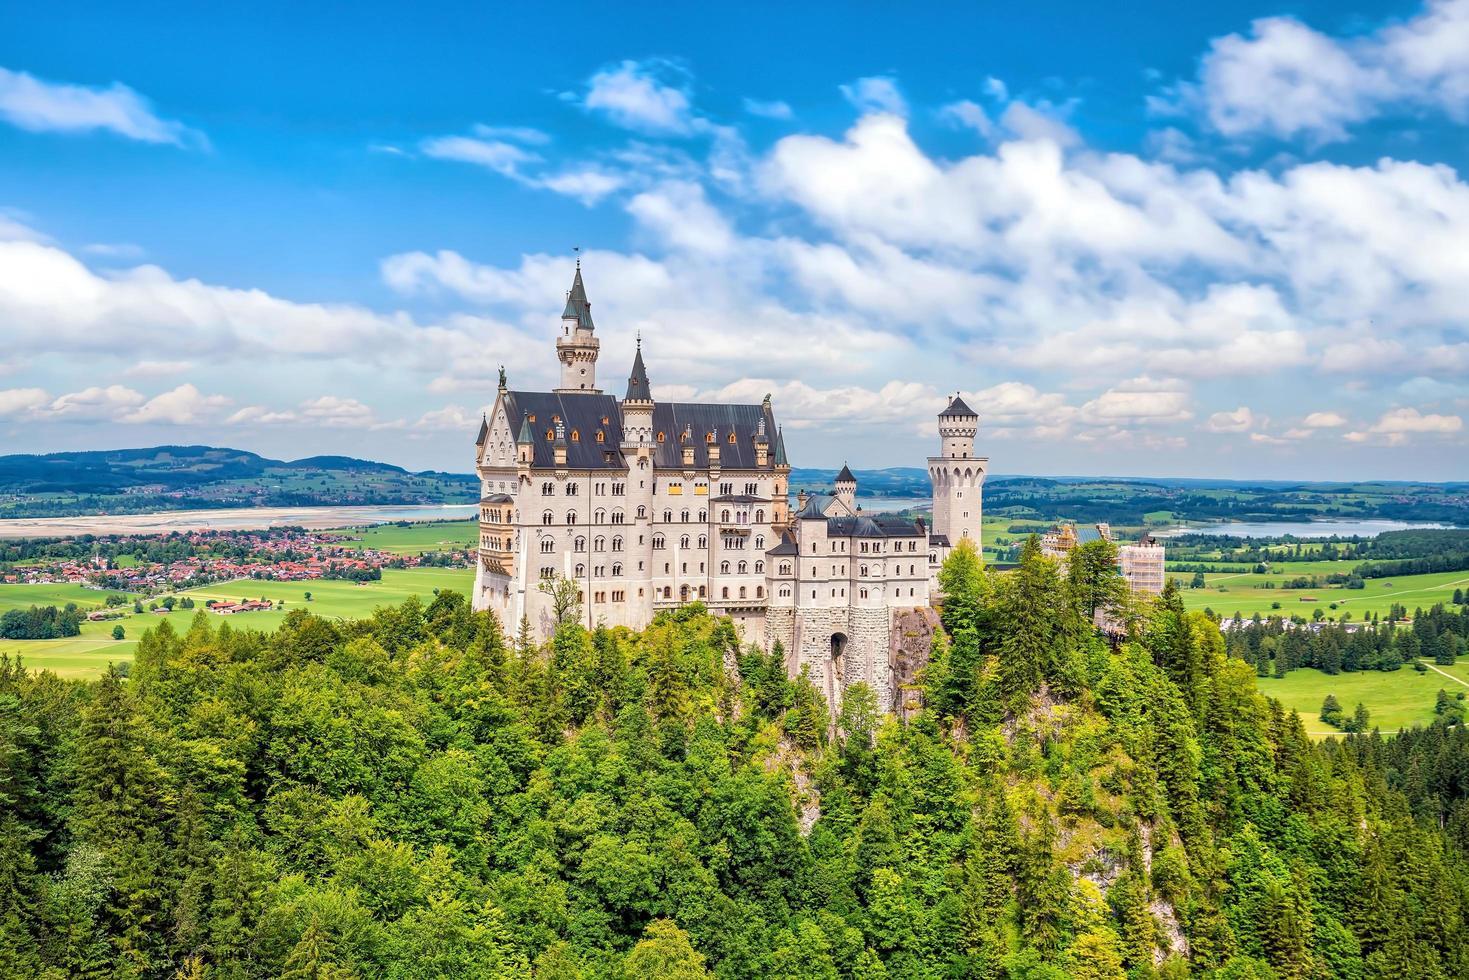 Neuschwanstein Castle, southwest Bavaria, Germany photo